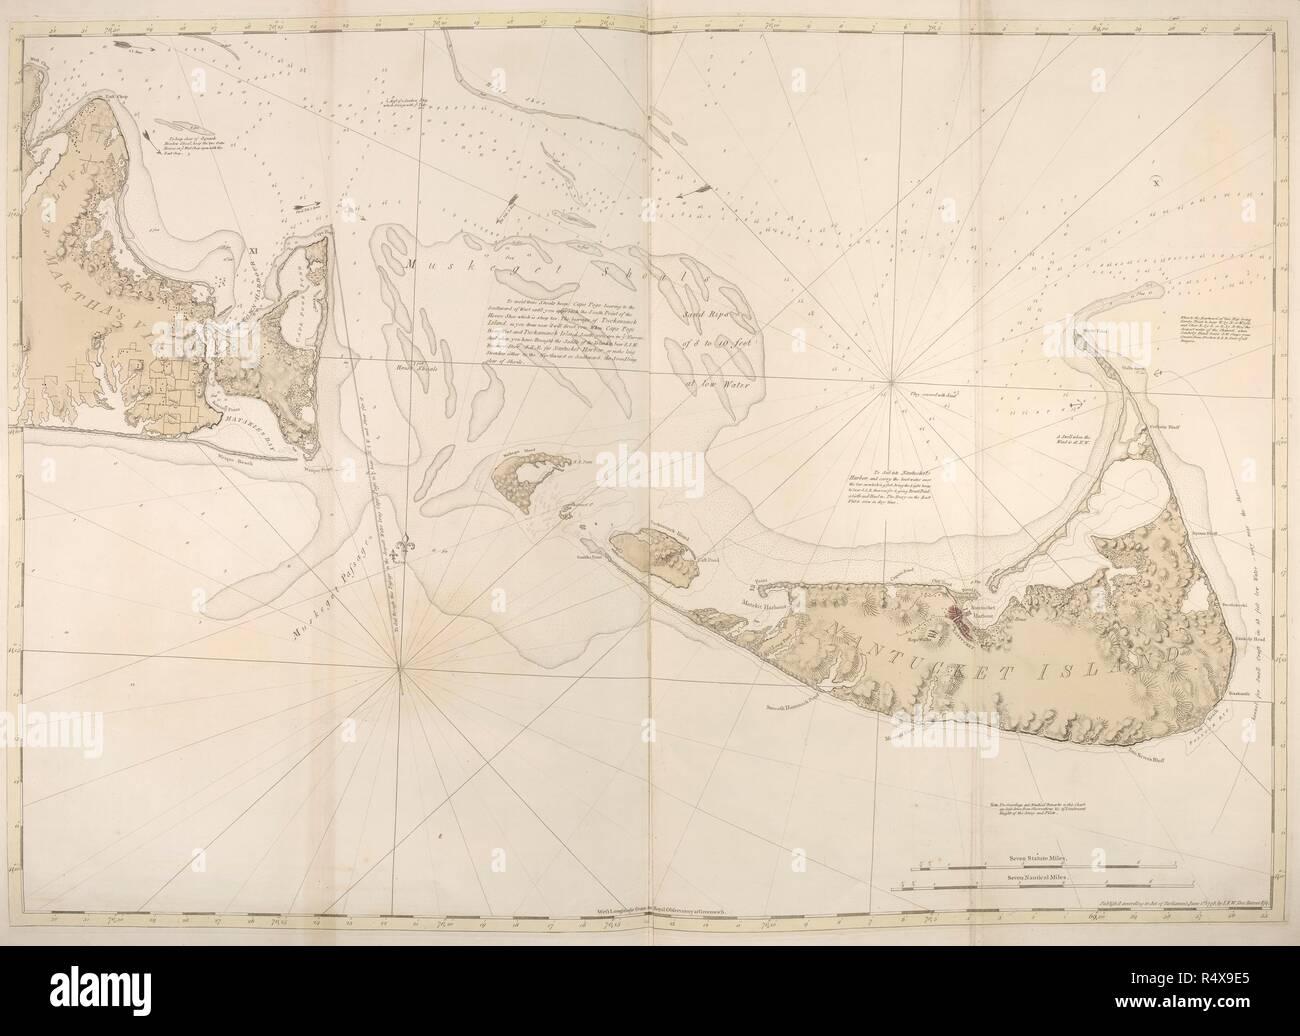 Nantucket Island. [A Chart of Nantucket Island... 1776. A ... on new england map, nantucket photos, nantucket real estate, charles river map, cape cod map, hawaii map, flights to nantucket, hyannis map, suffolk county map, long island map, nantucket hotels, united states map, nantucket airlines, west indies map, nantucket tourism, maine map, martha's vineyard map, town of nantucket, north carolina map, newport map, block island map, plymouth map, connecticut shore map, boston map, nantucket vacation rentals, south carolina map, massachusetts map, nantucket.net, hudson ma on map, billingsgate island map, nantucket attractions, nantucket guide,